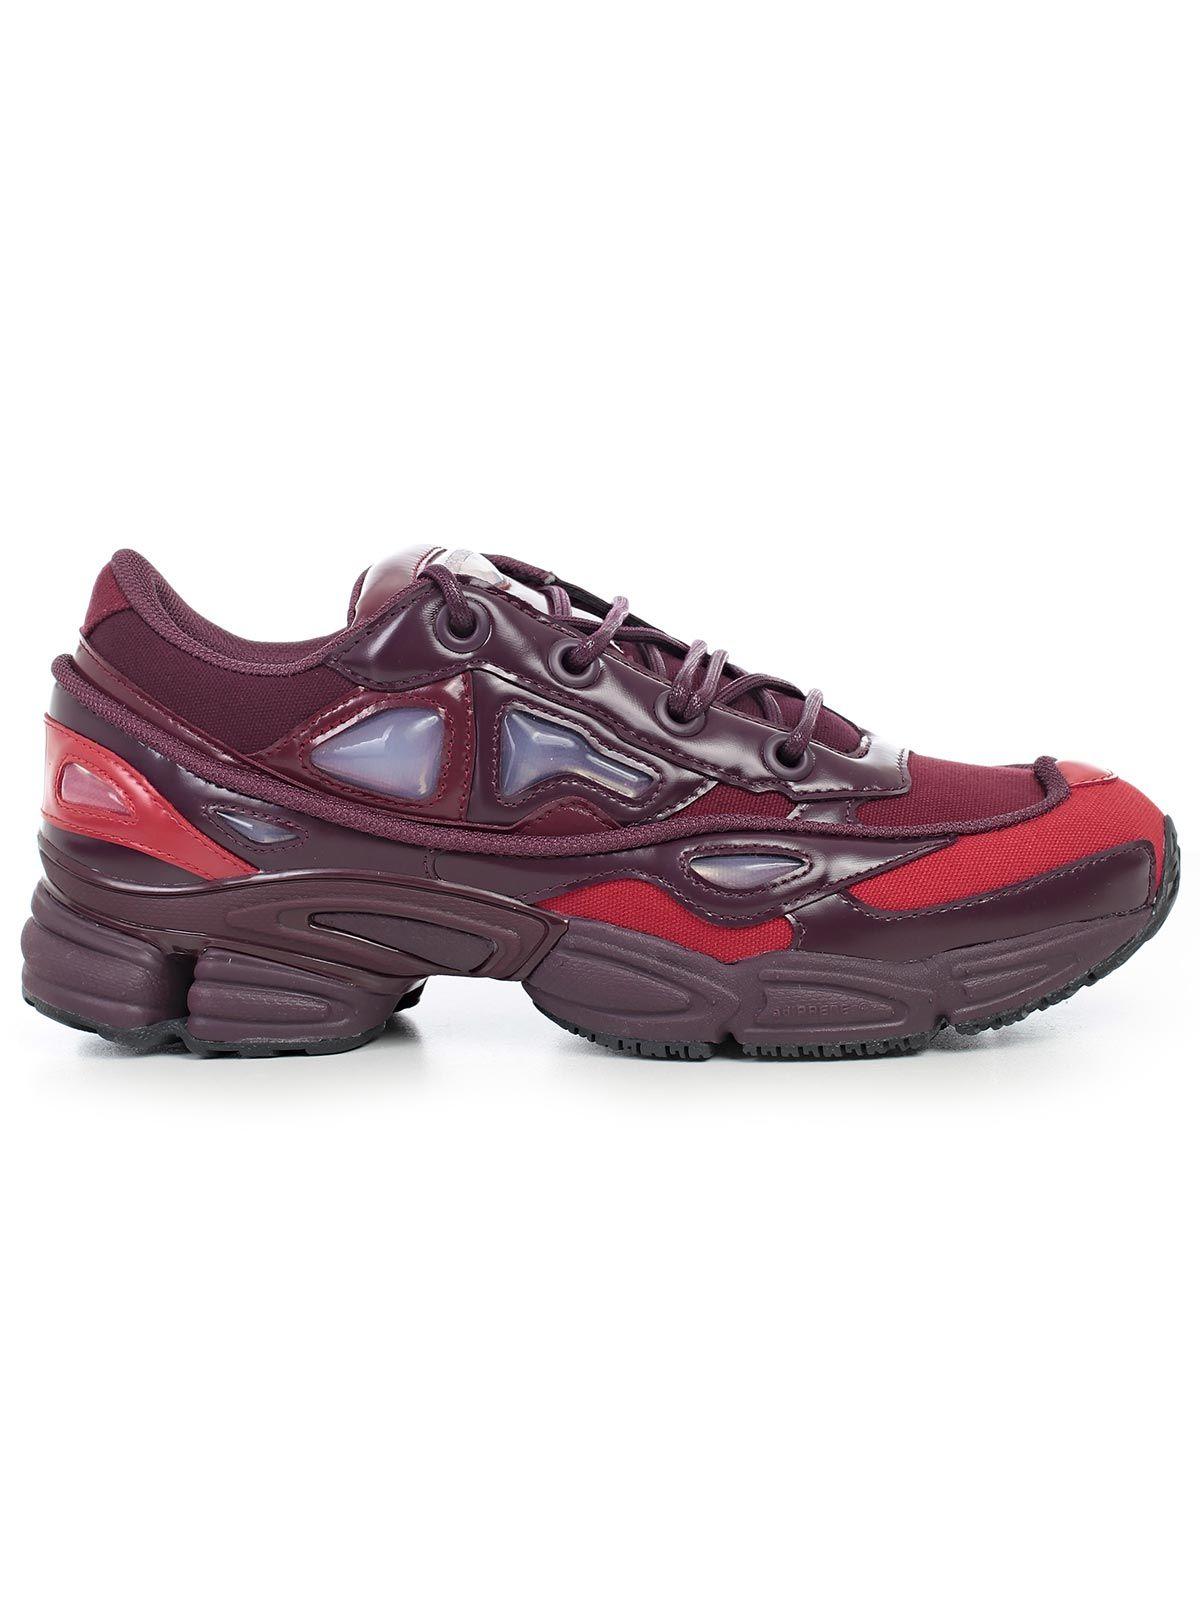 ADIDAS BY RAF SIMONS OZWEEGO III SNEAKERS.  adidasbyrafsimons  shoes ... 9fa2423c9